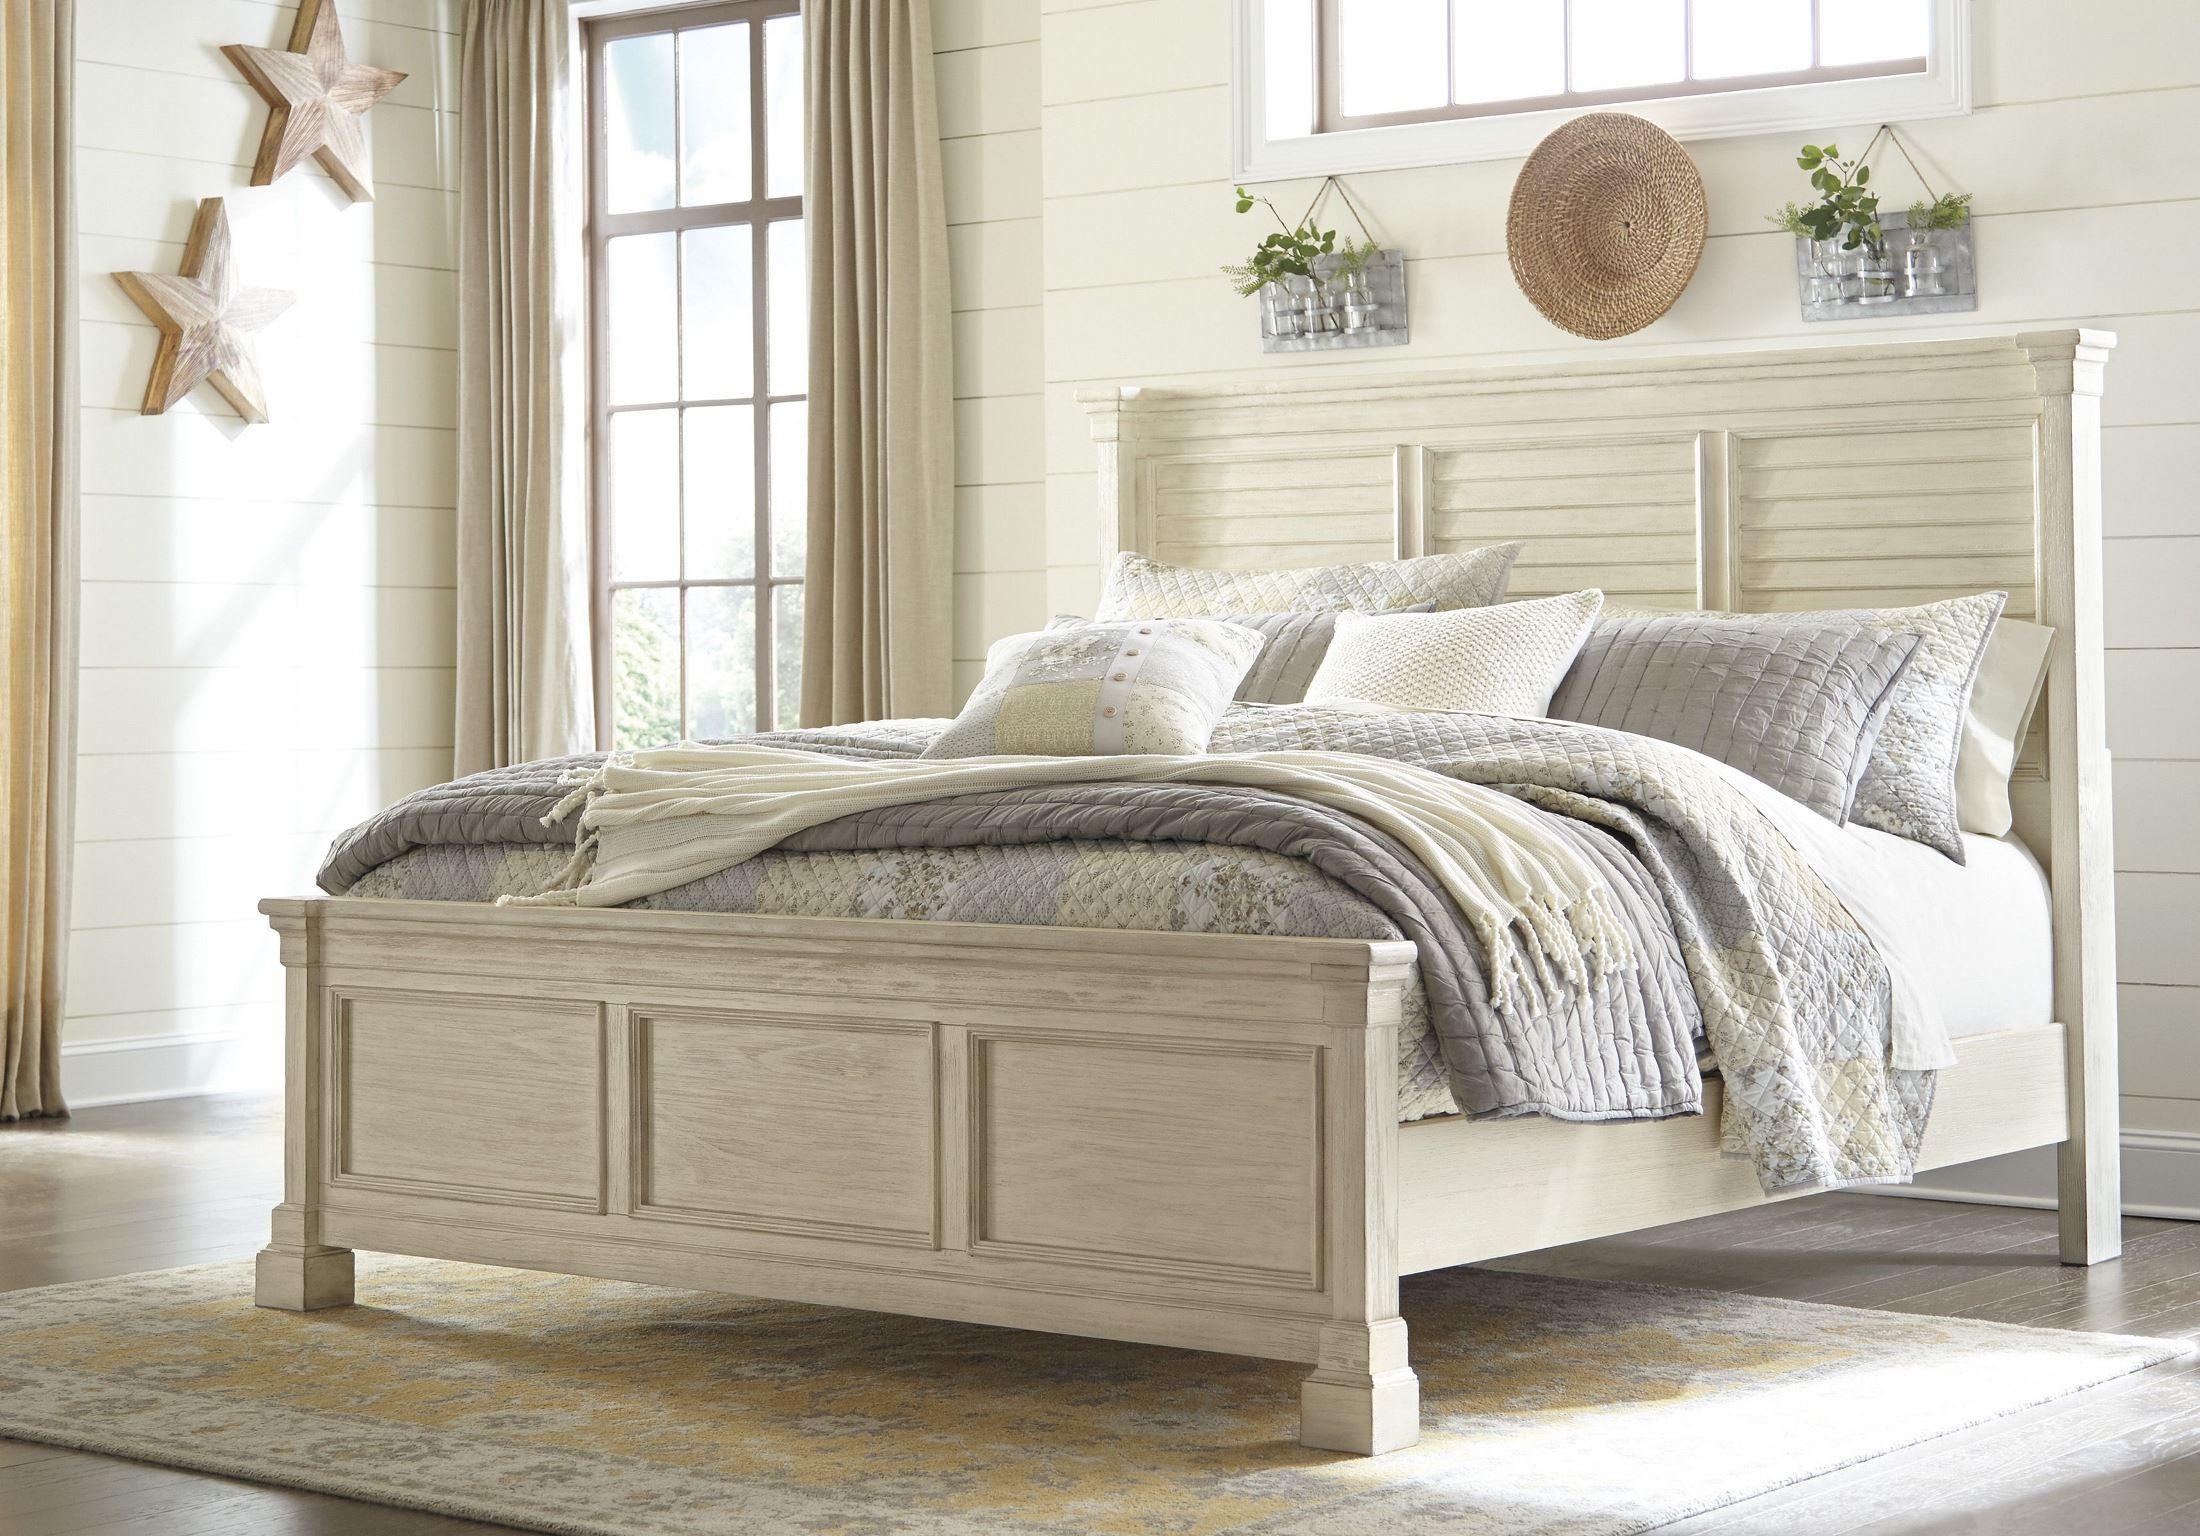 Bolanburg White Panel Bedroom Set B647 54 57 96 Ashley